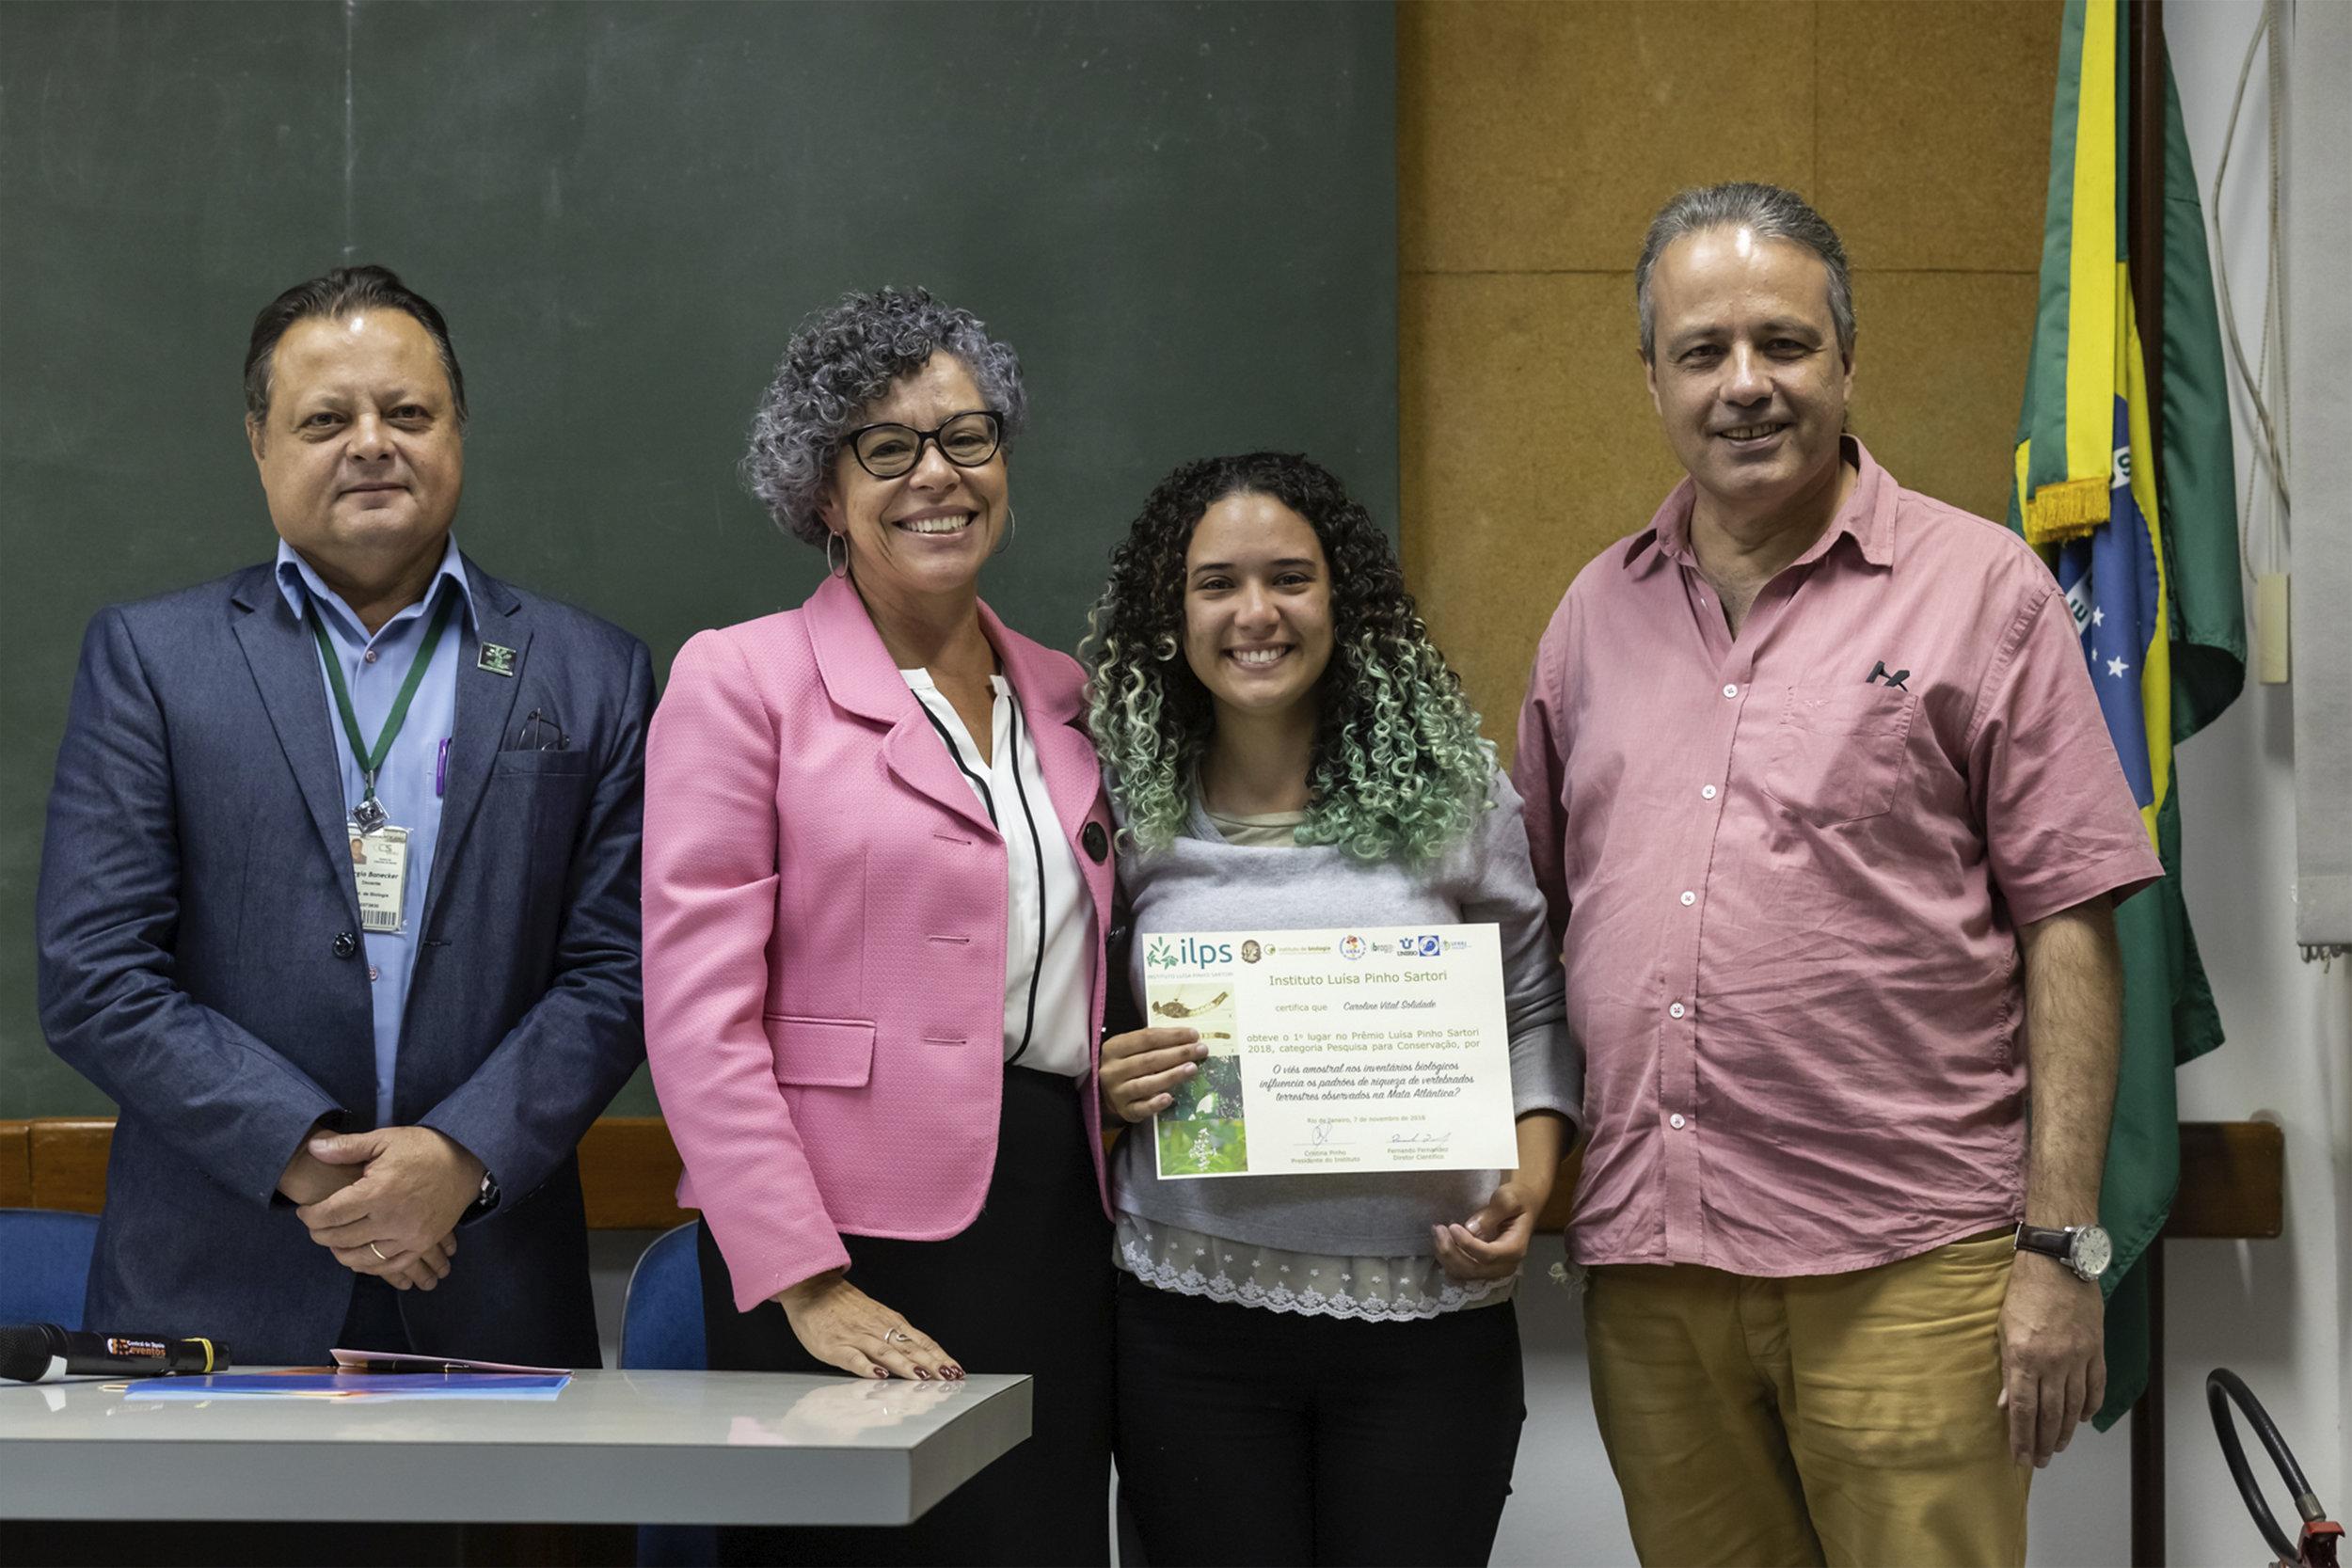 Prêmio Luísa 2018 (Foto zero8onze_2018) (1) - cópia.jpg